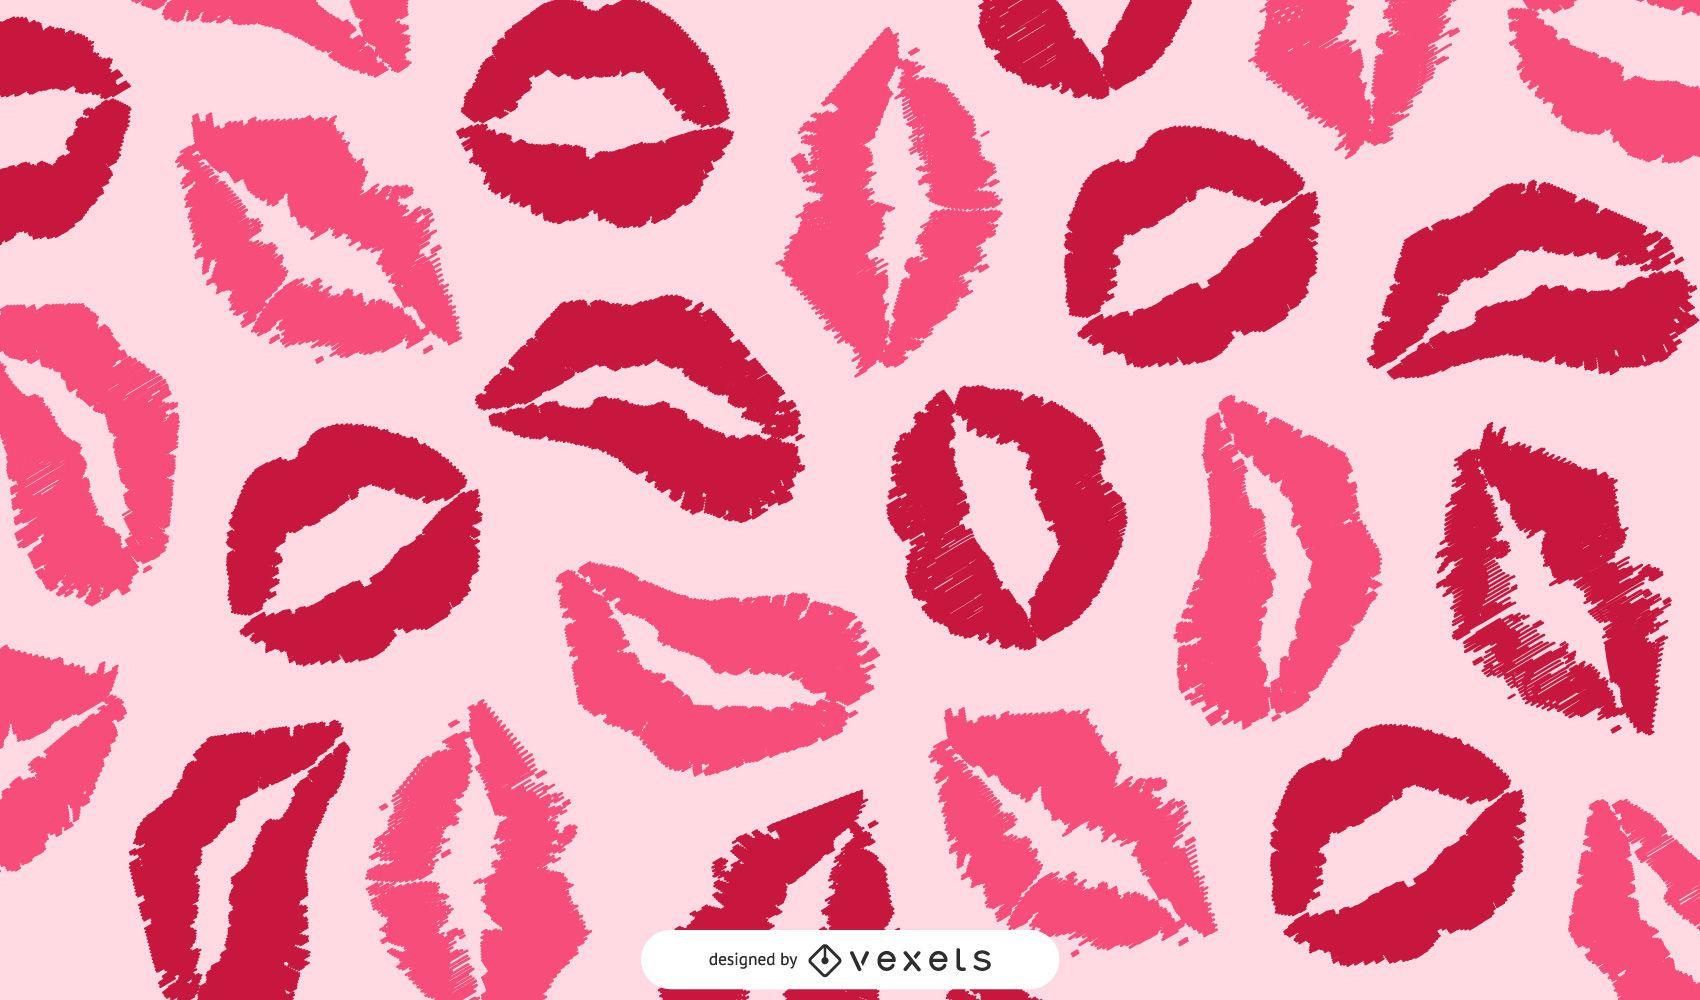 Free Vector Graphic Art Kiss